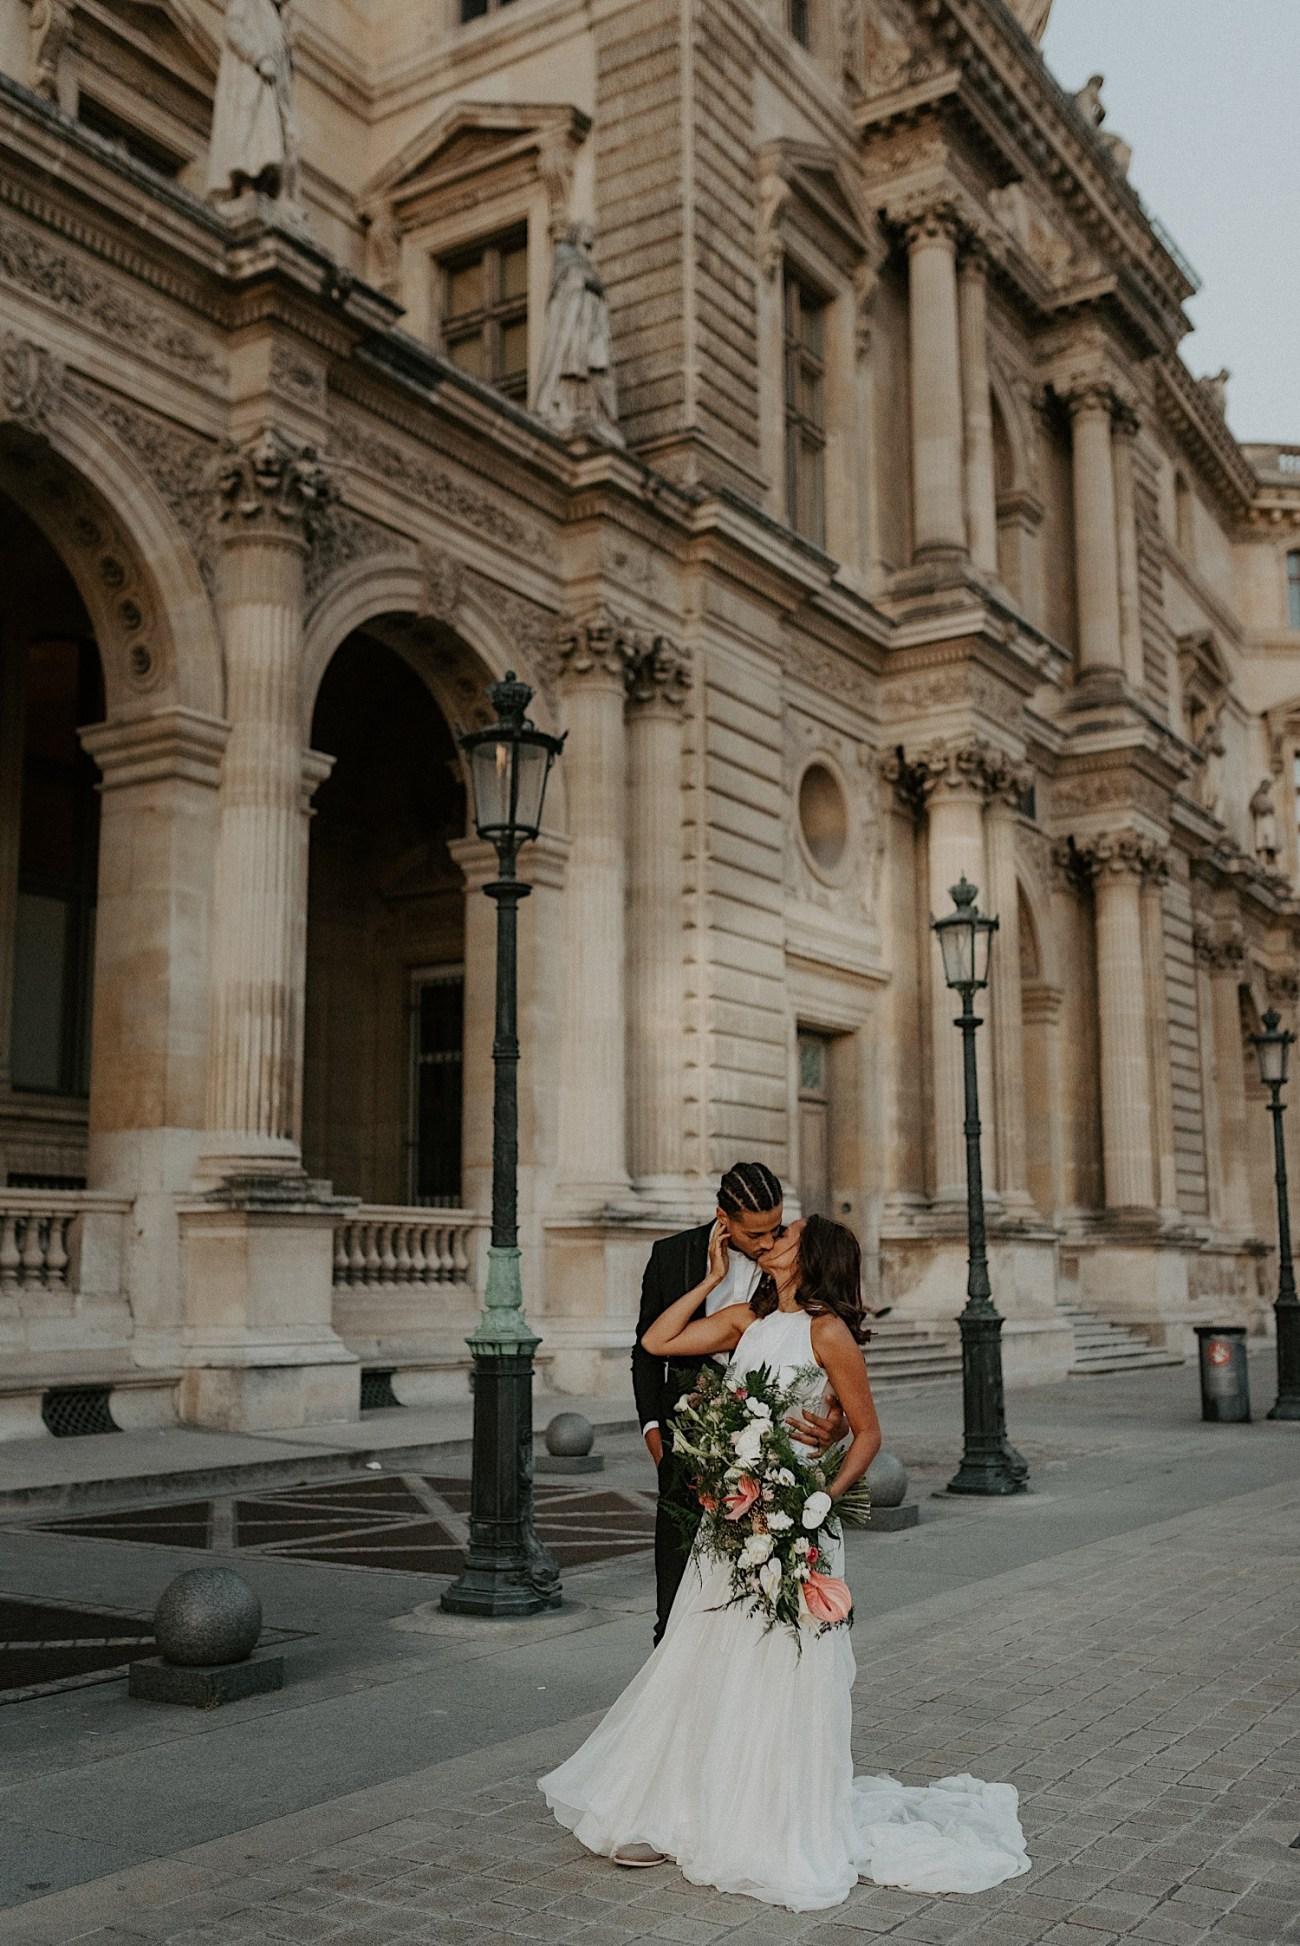 Paris Louvre Wedding Photos Paris Wedding Photographer Destination Wedding France Anais Possamai Photography 37